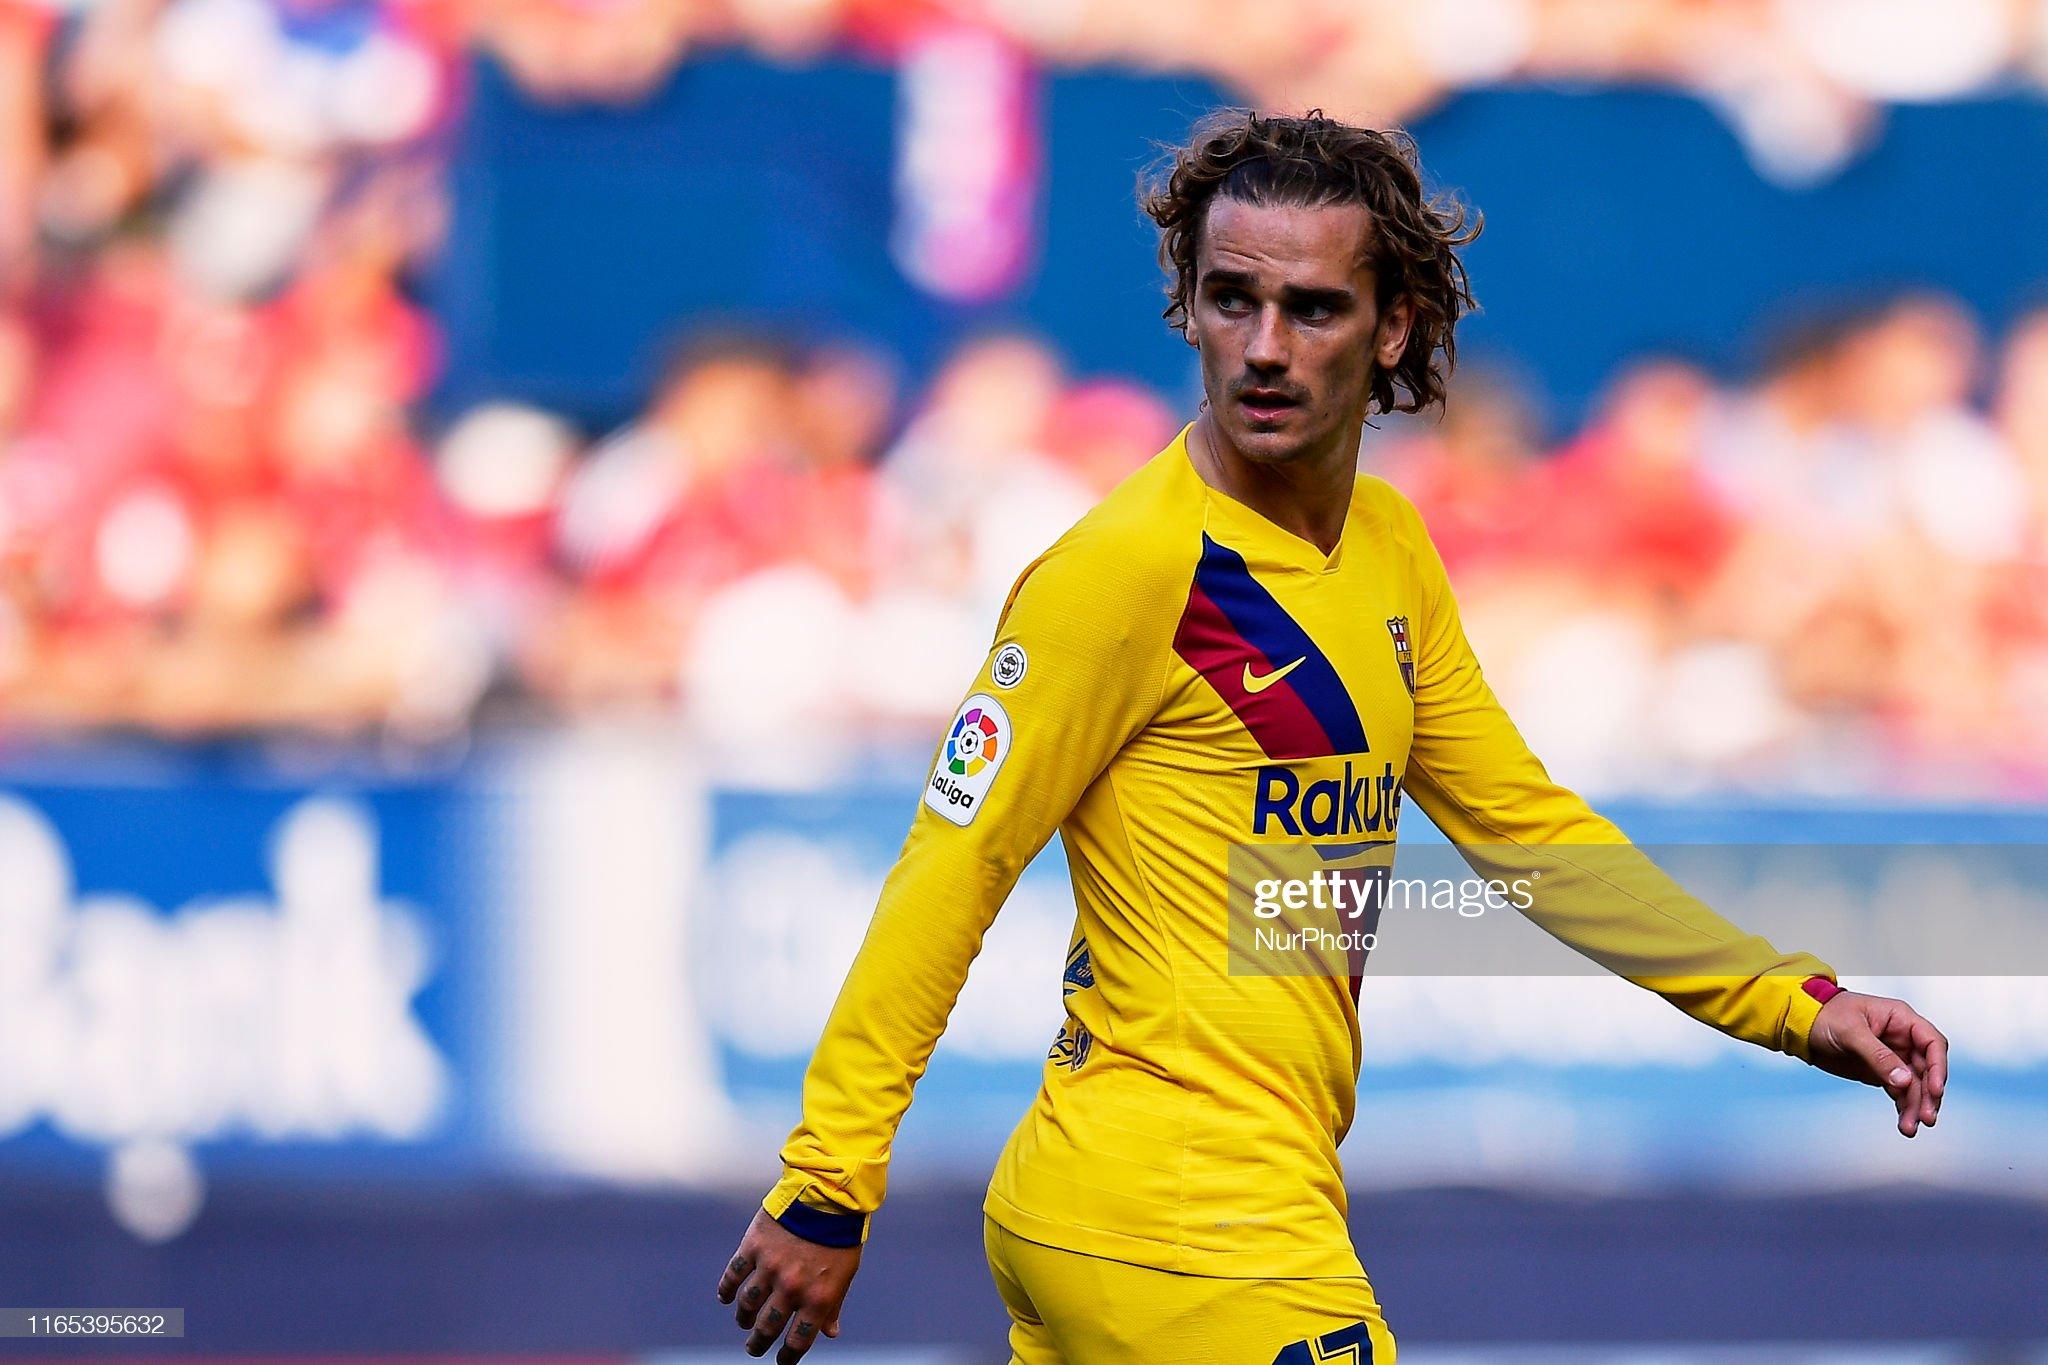 صور مباراة : أوساسونا - برشلونة 2-2 ( 31-08-2019 )  Antoine-griezmann-of-barcelona-looks-on-during-the-liga-match-between-picture-id1165395632?s=2048x2048